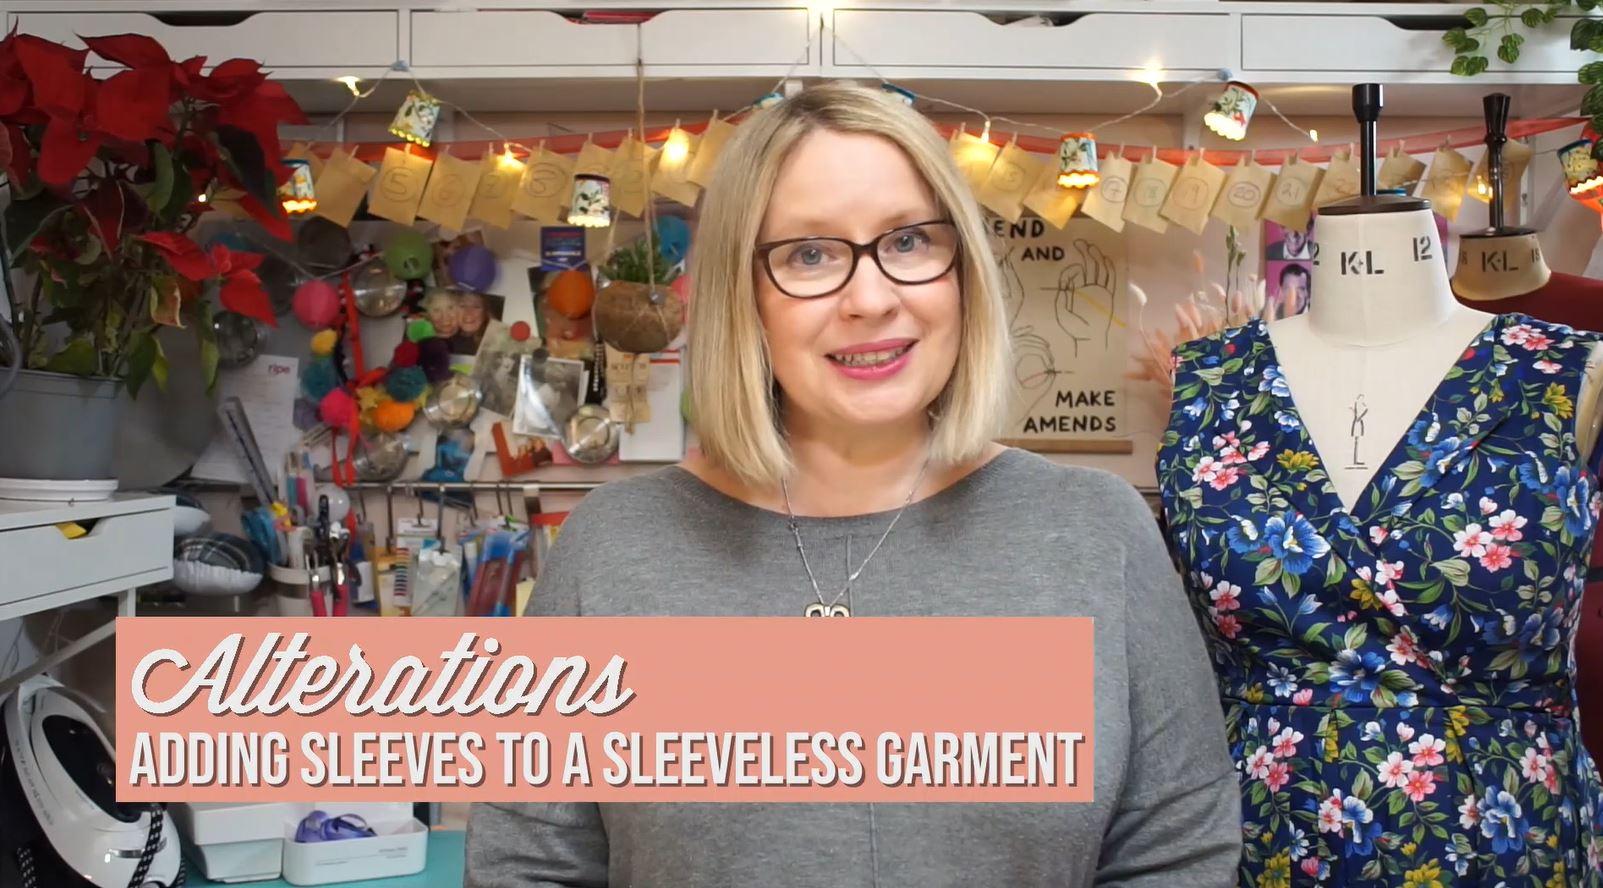 Vimeo on demand Lesson - Adding sleeves to a sleeveless garment